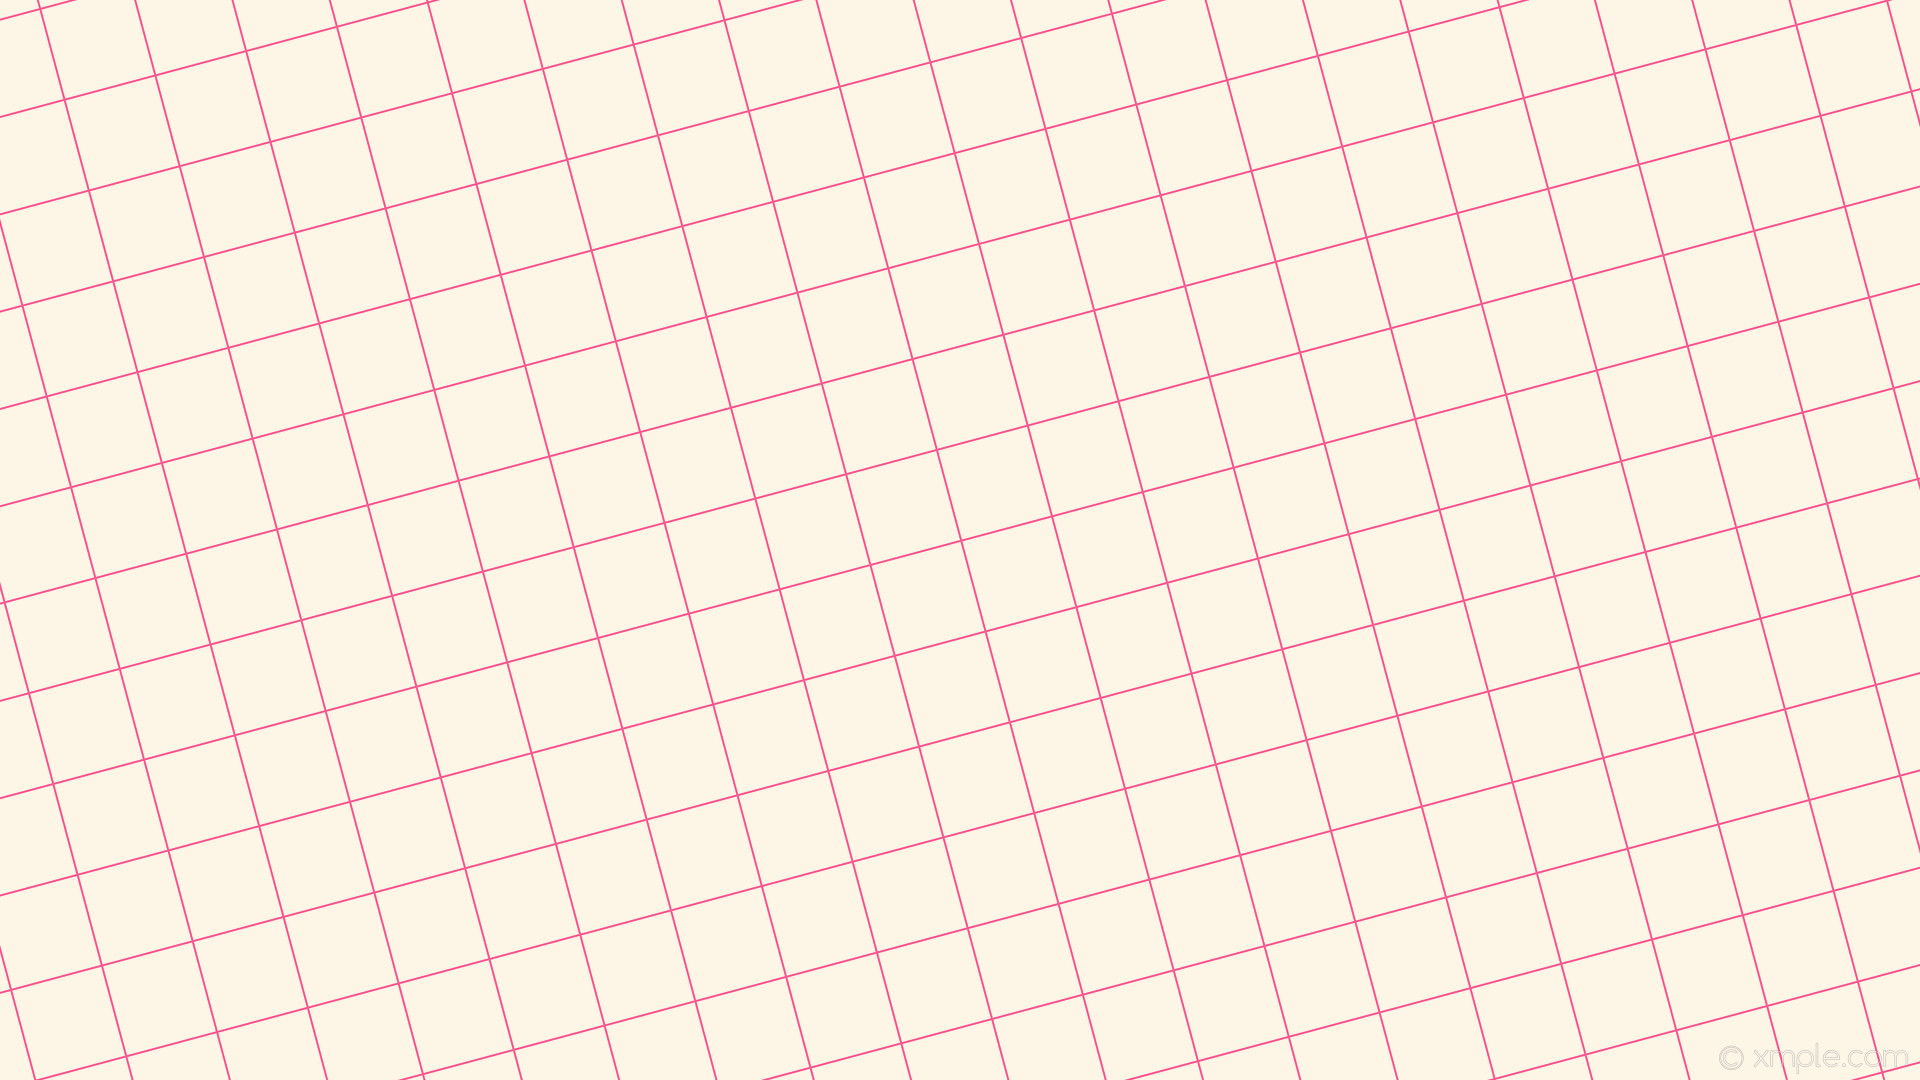 Res: 1920x1080, wallpaper graph paper white grid pink old lace #fdf5e6 #f61b6e 15° 2px 94px